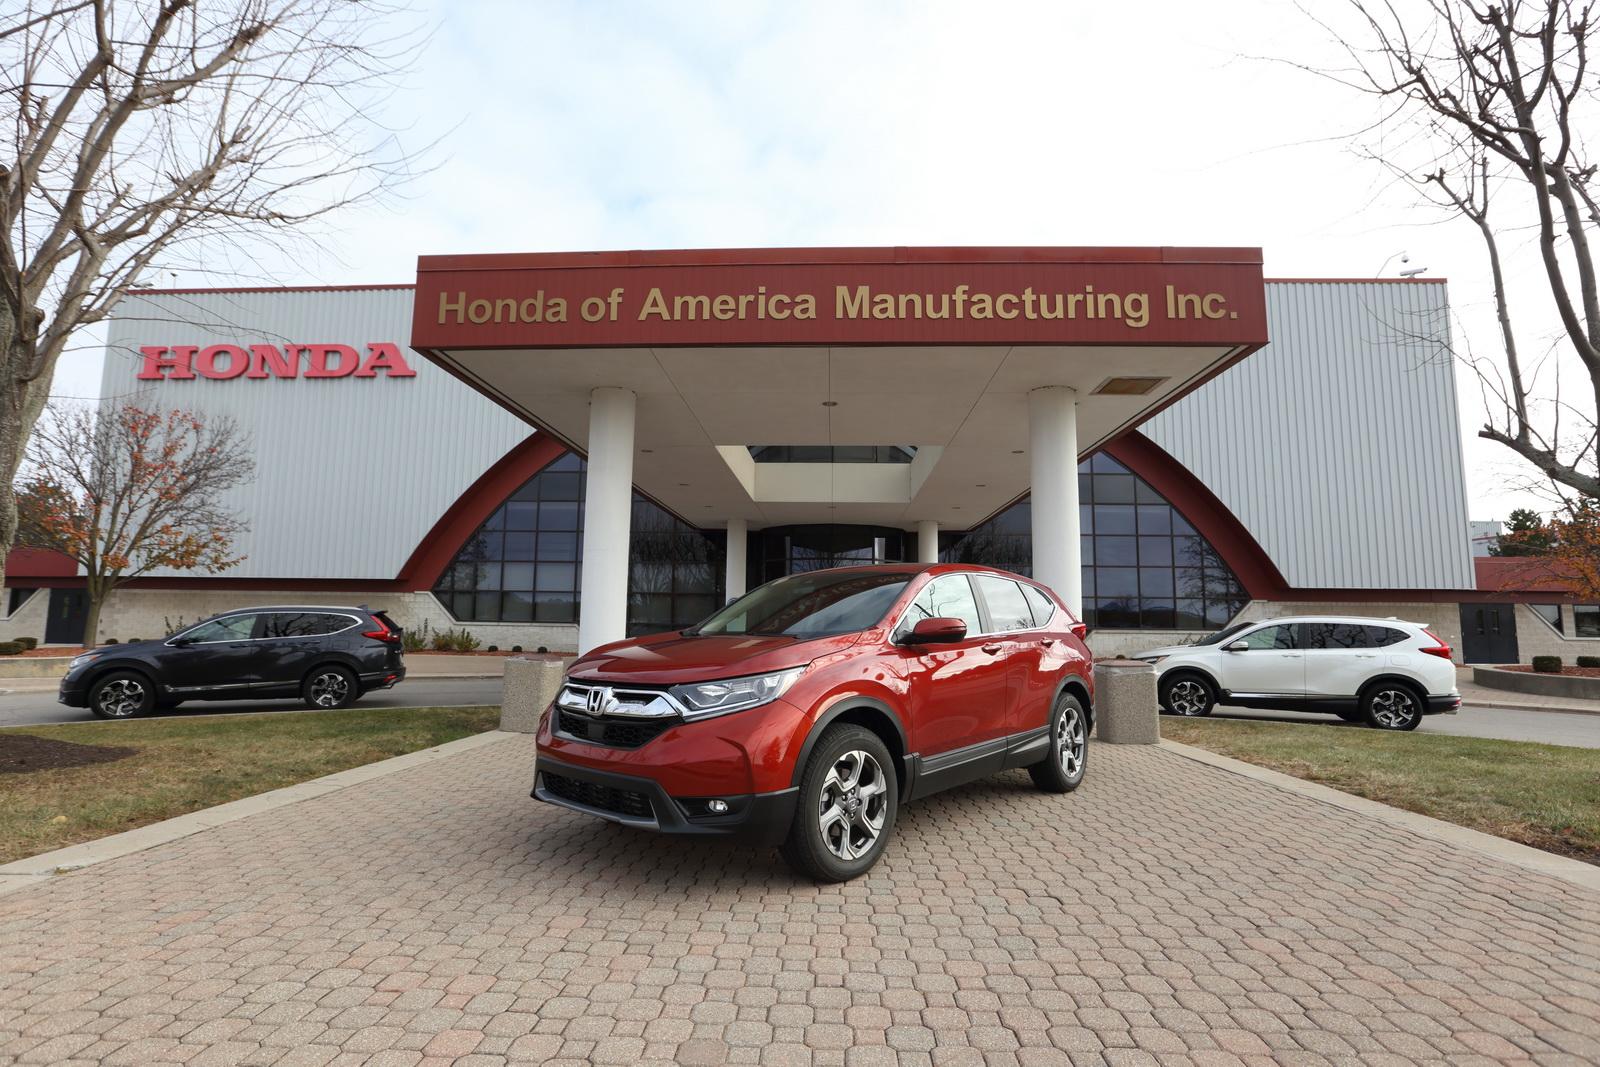 1.5L Turbocharged 2017 Honda CR-V - CRVManufacturingEvent1